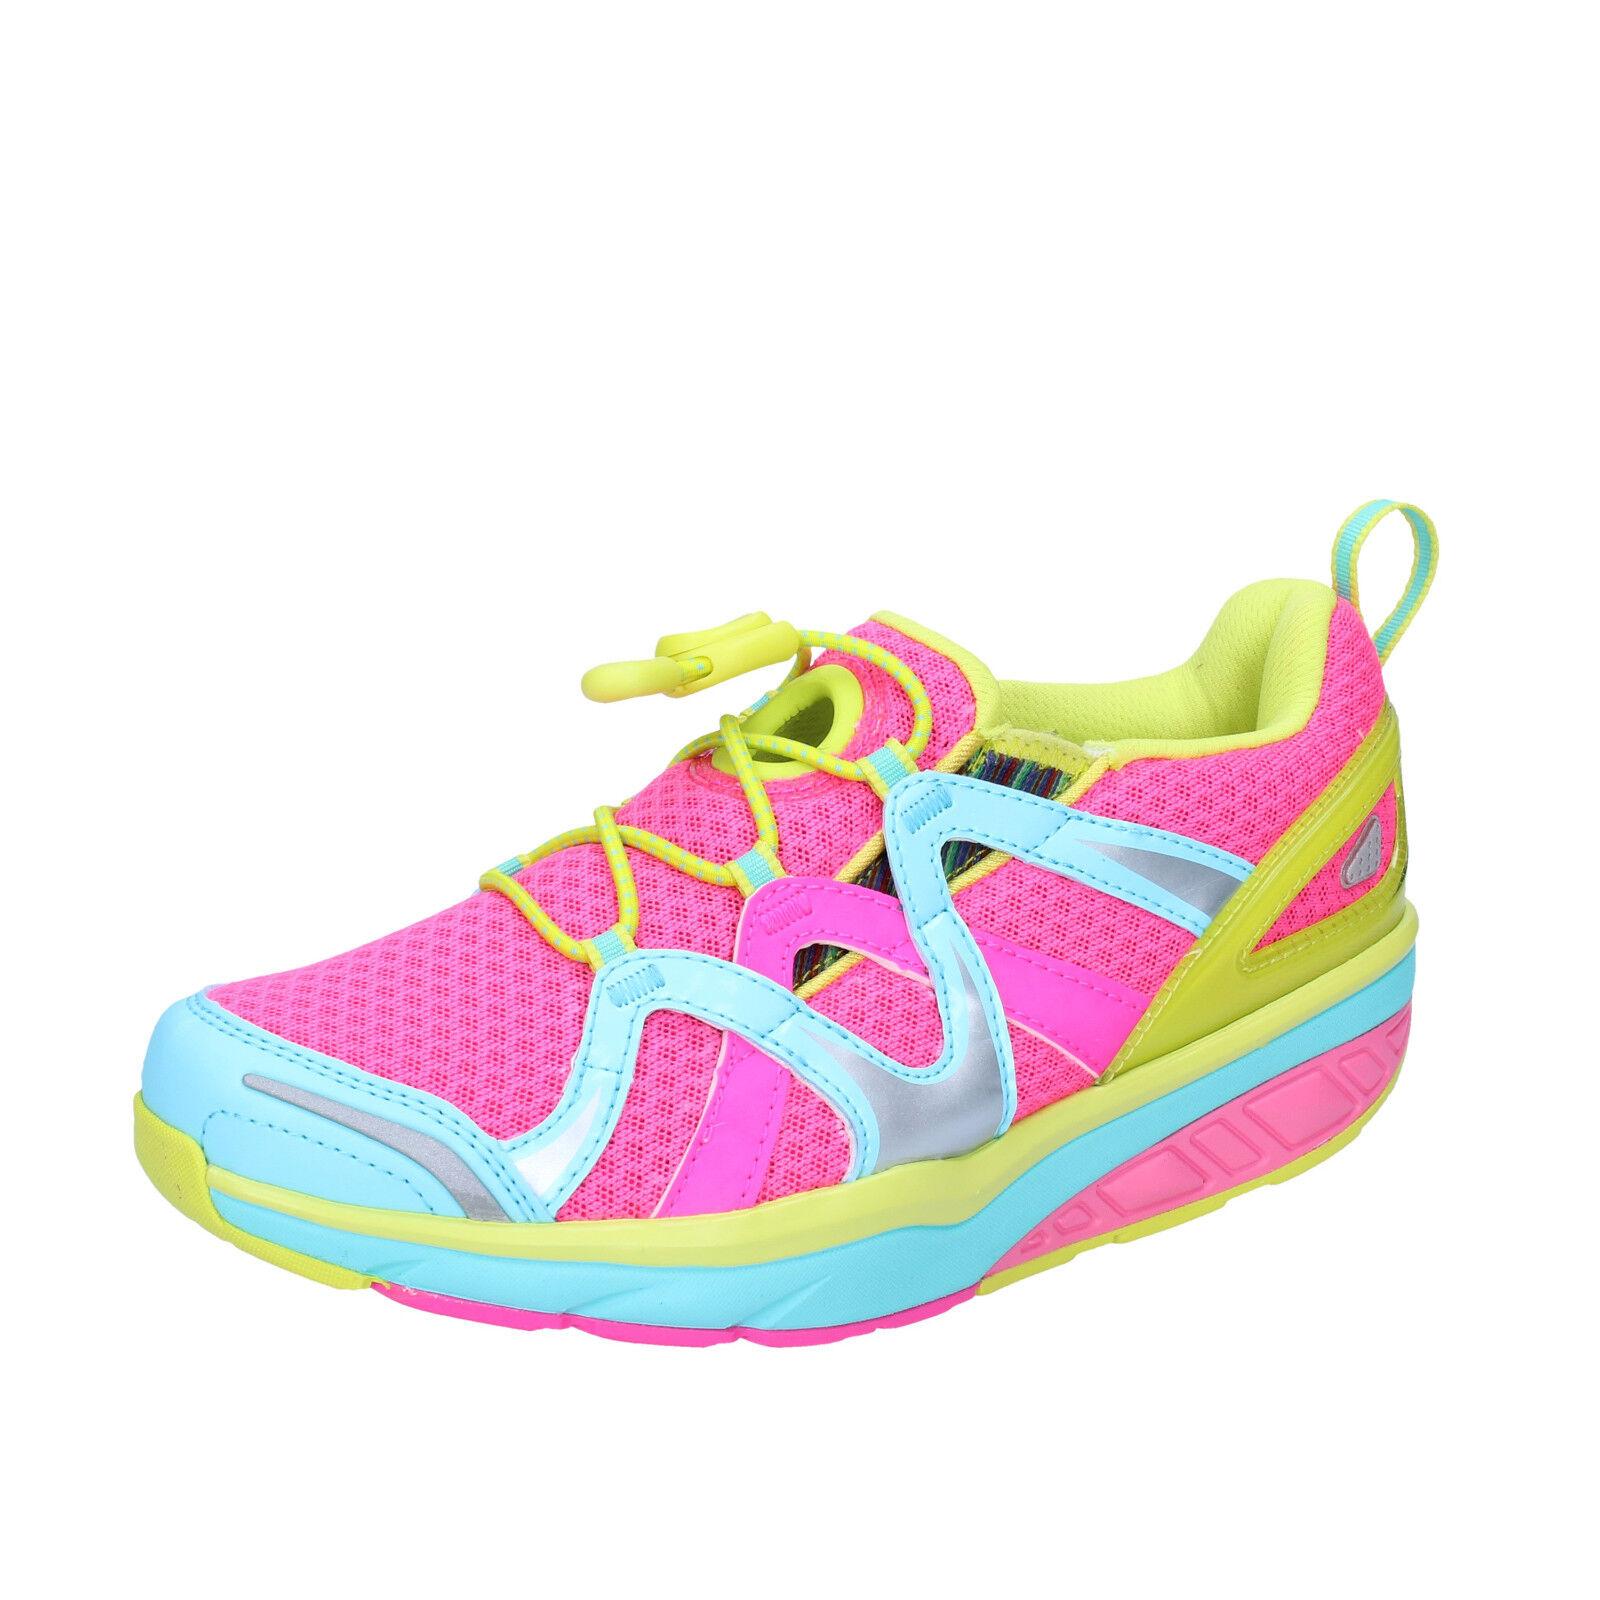 Damen schuhe MBT AFIYA 35 sneakers pink textil dynamic BT21-35